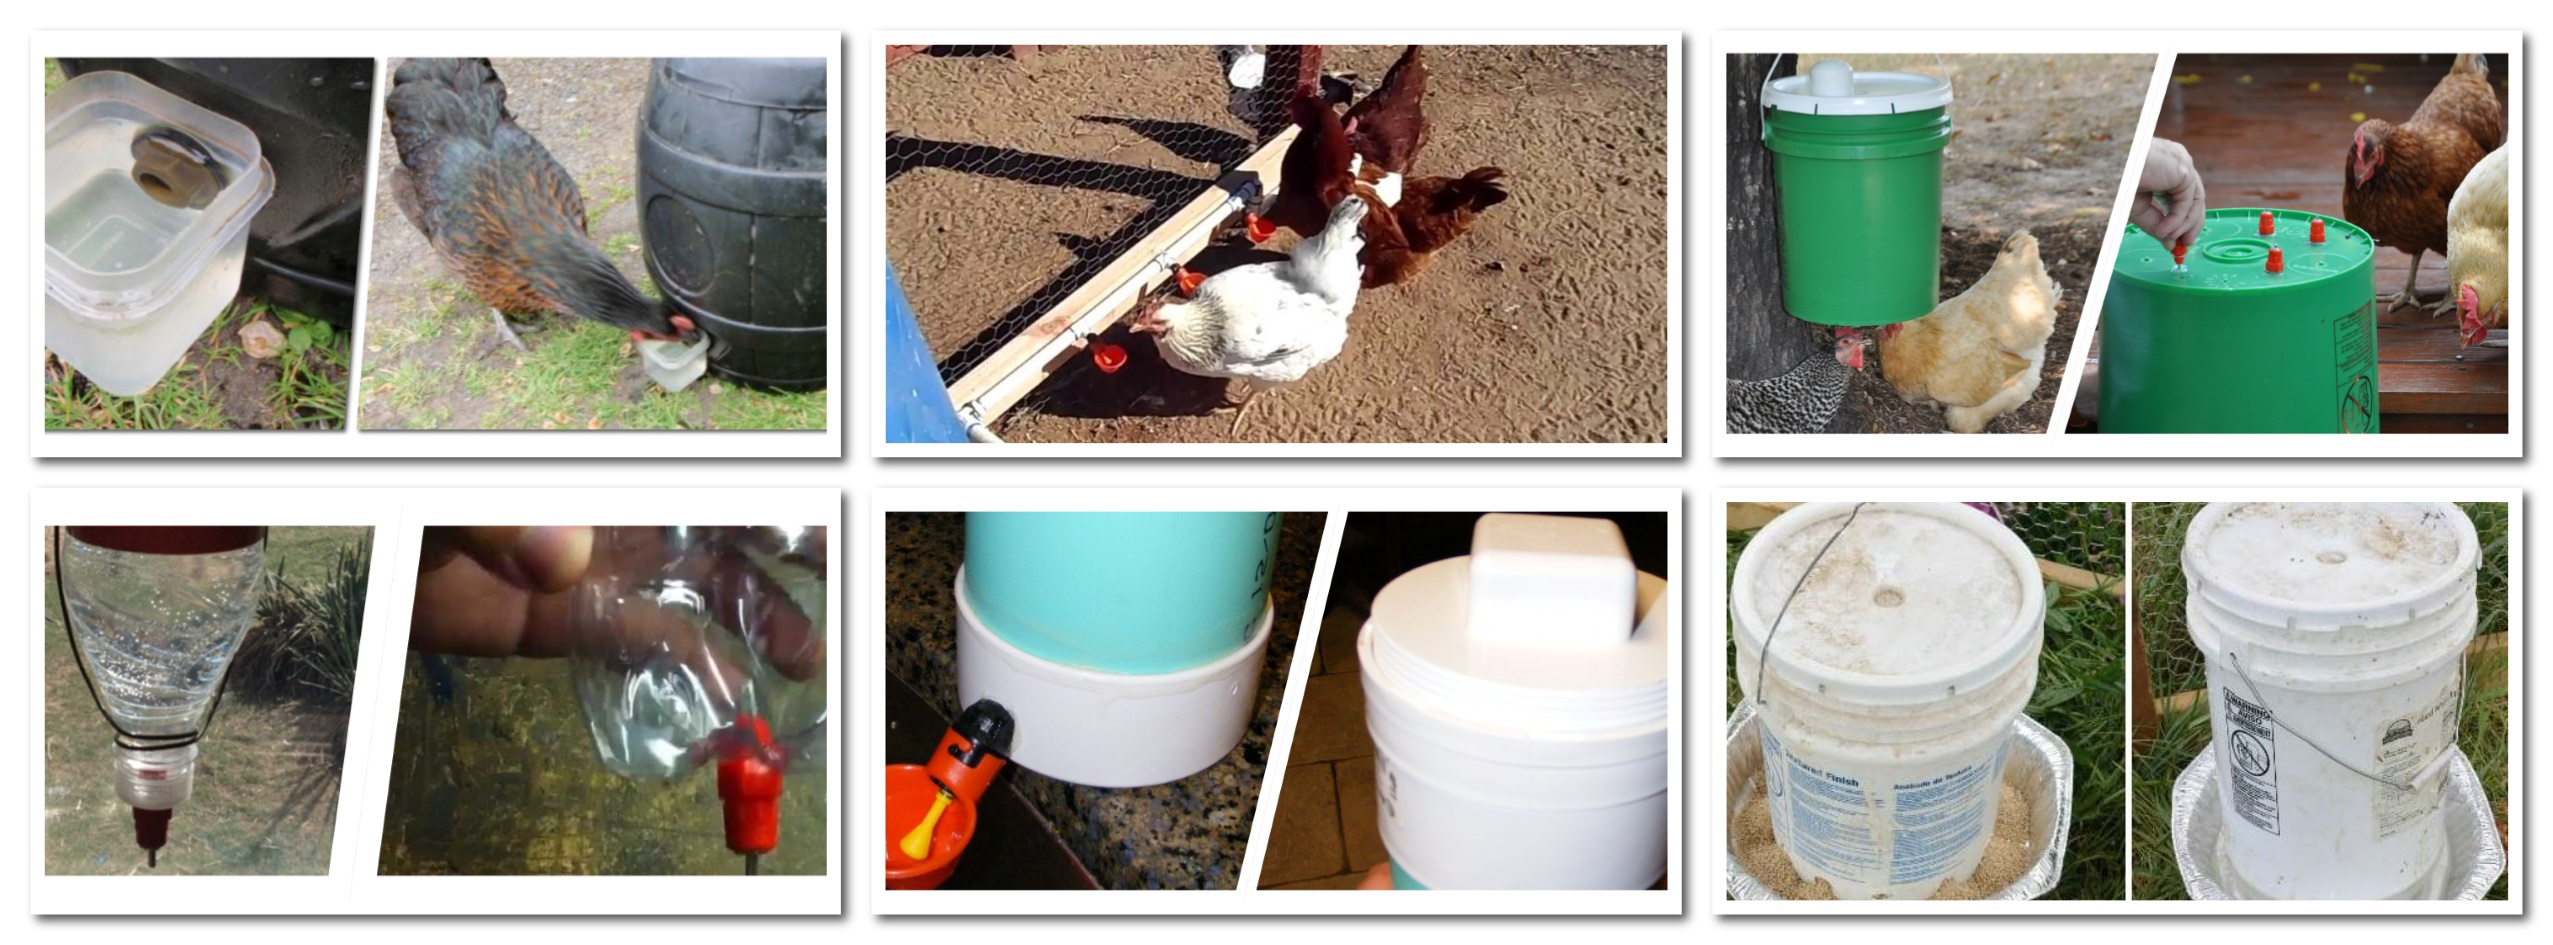 6 Creative Diy Chicken Waterer Ideas Go Cluck Cluck